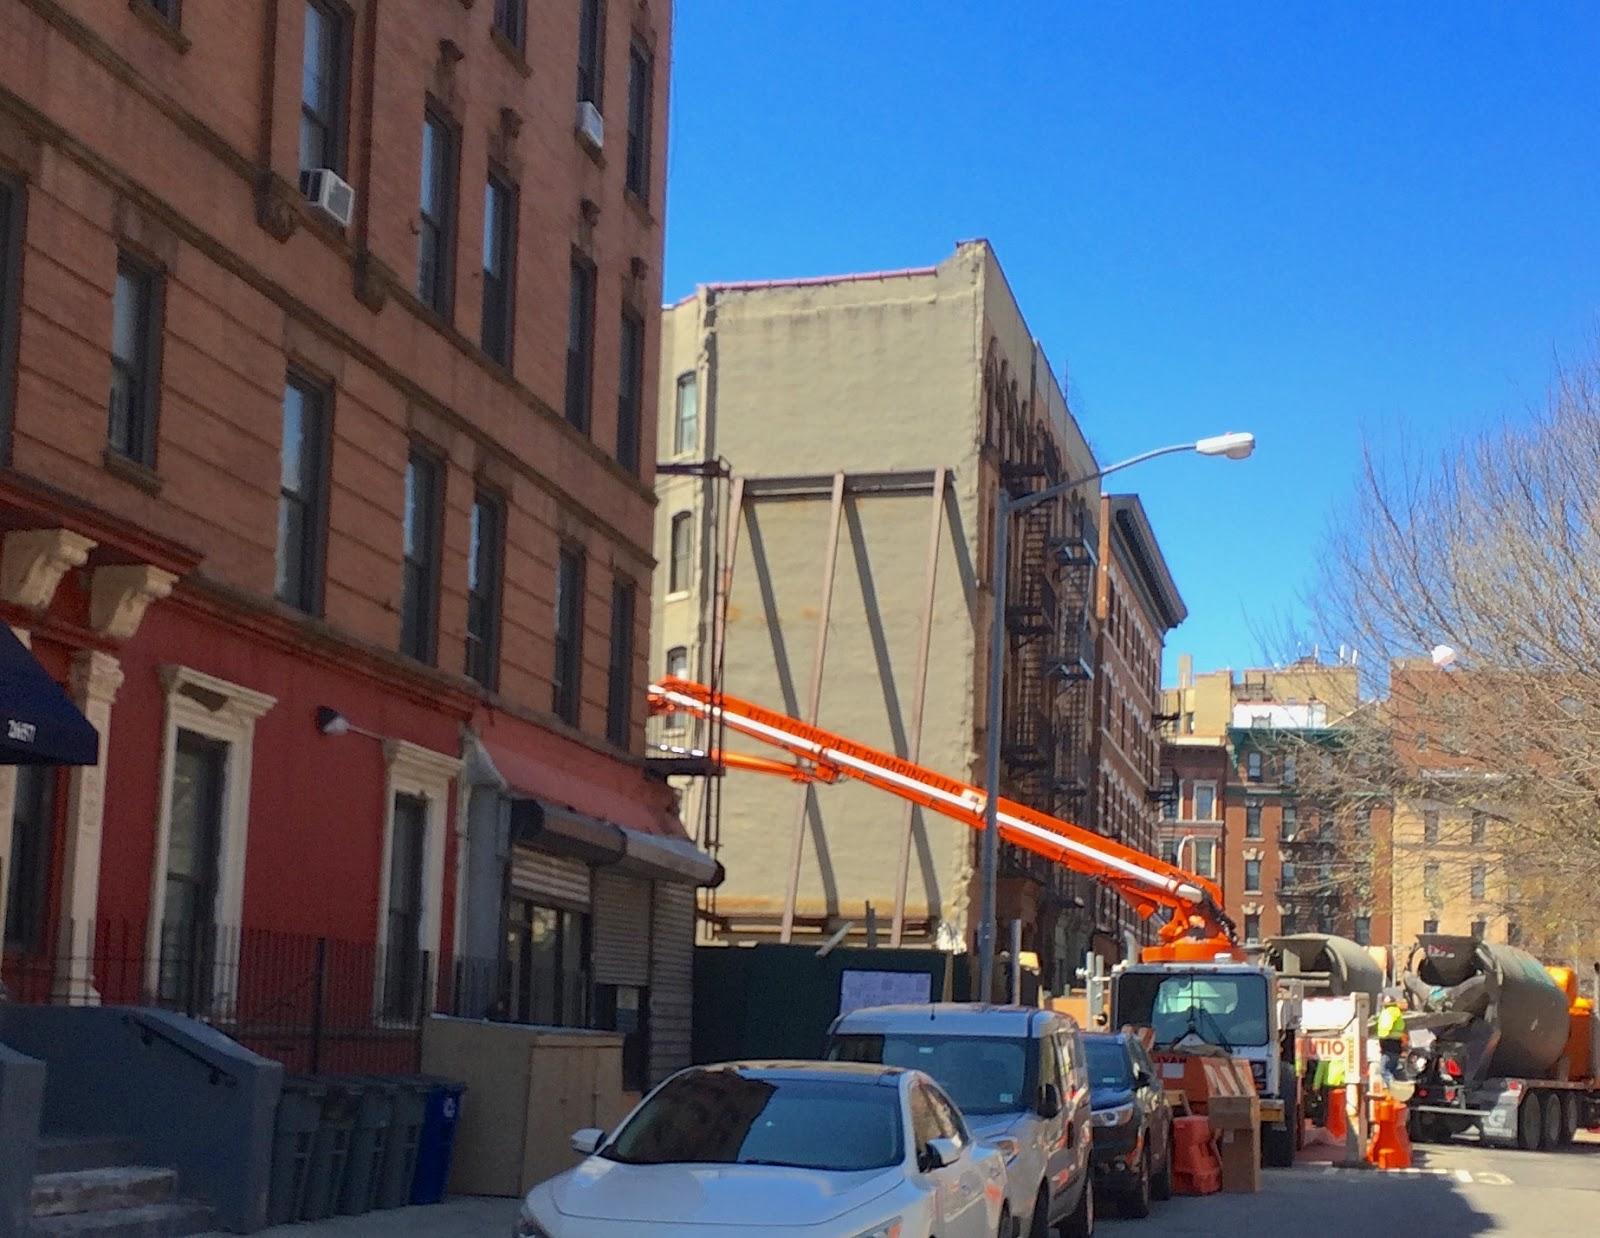 306 West 142nd Street